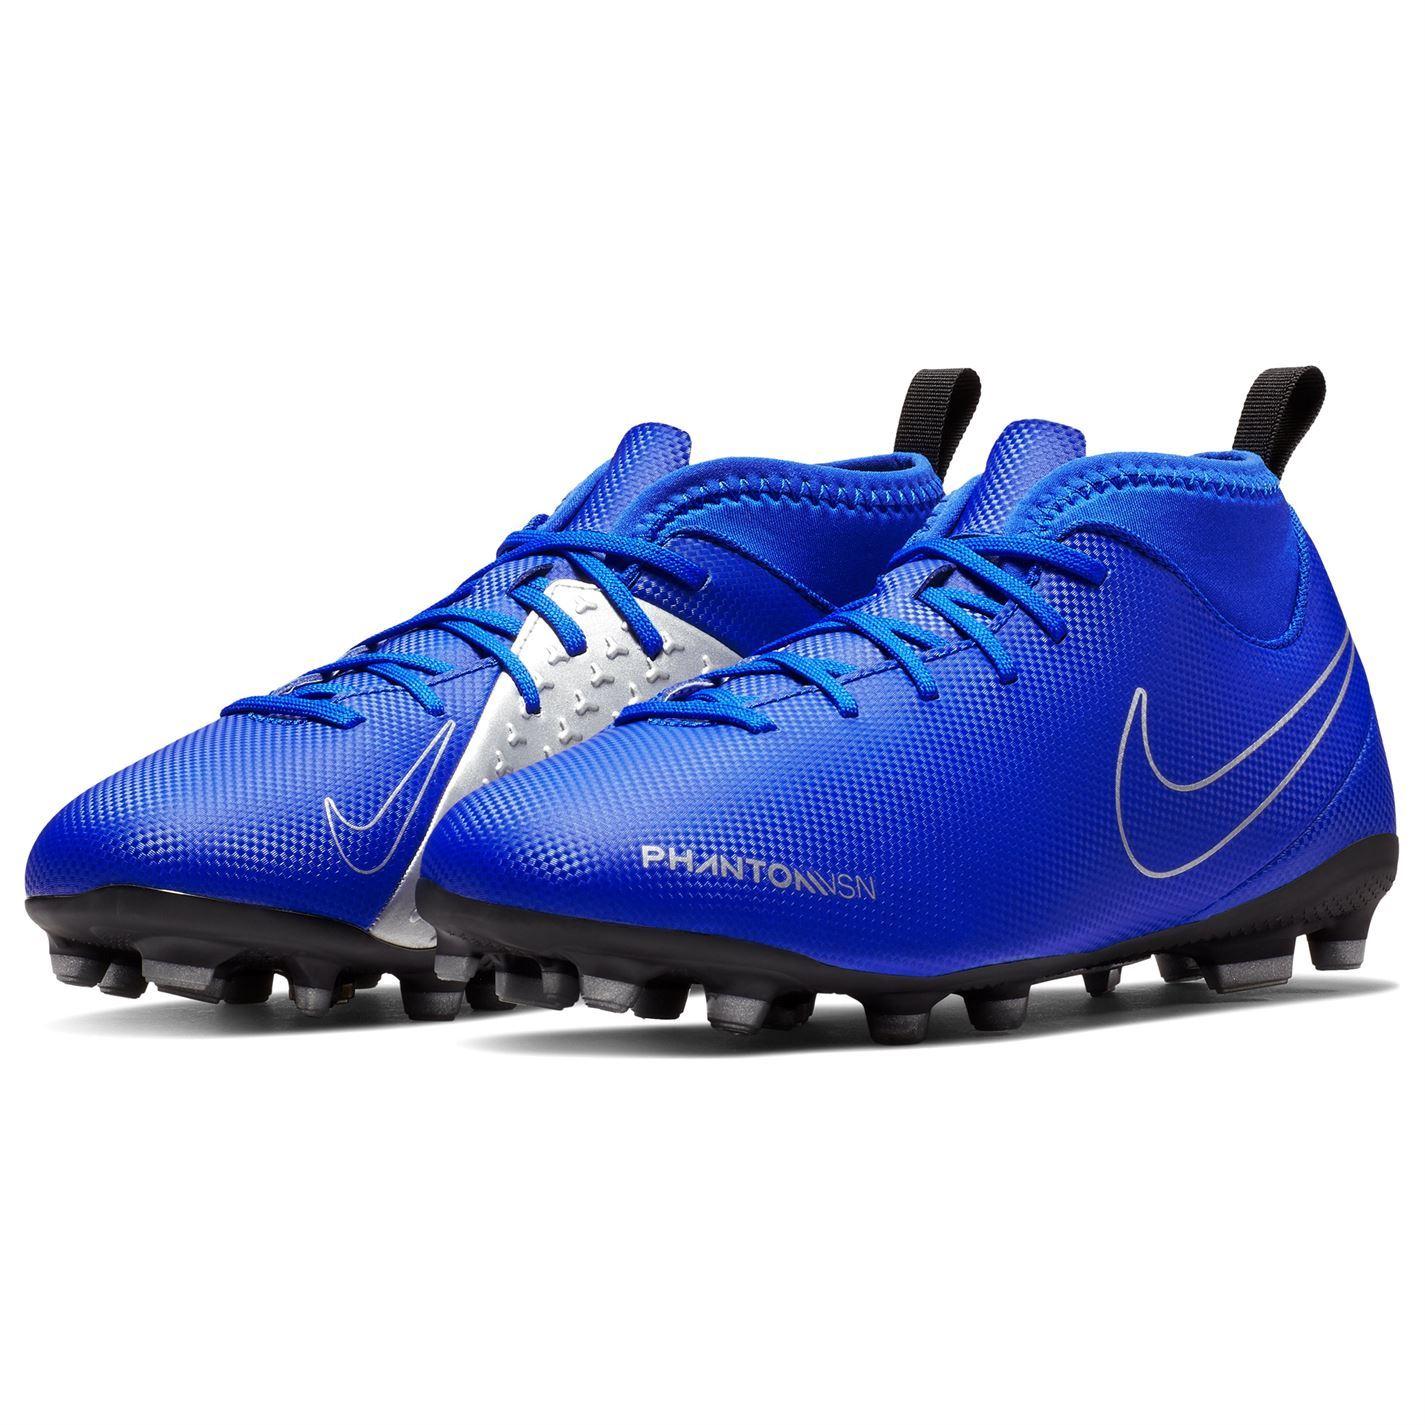 miniature 7 - Nike-Phantom-Vision-Club-DF-FG-Firm-Ground-Chaussures-De-Football-Juniors-Football-Crampons